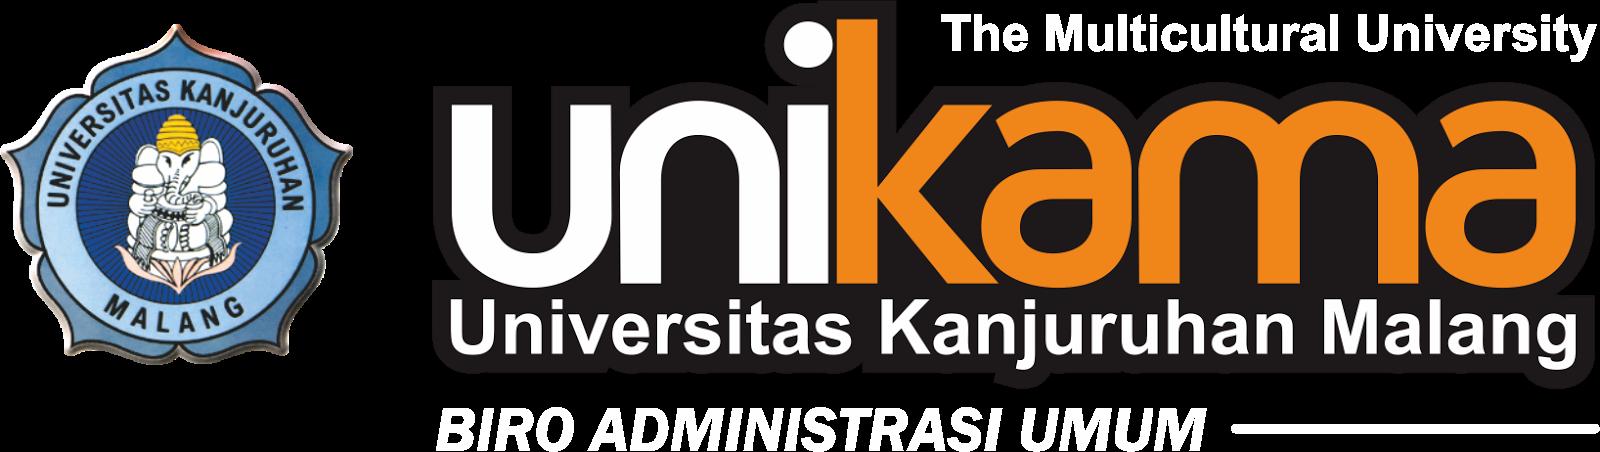 University of Kanjuruhan Malang